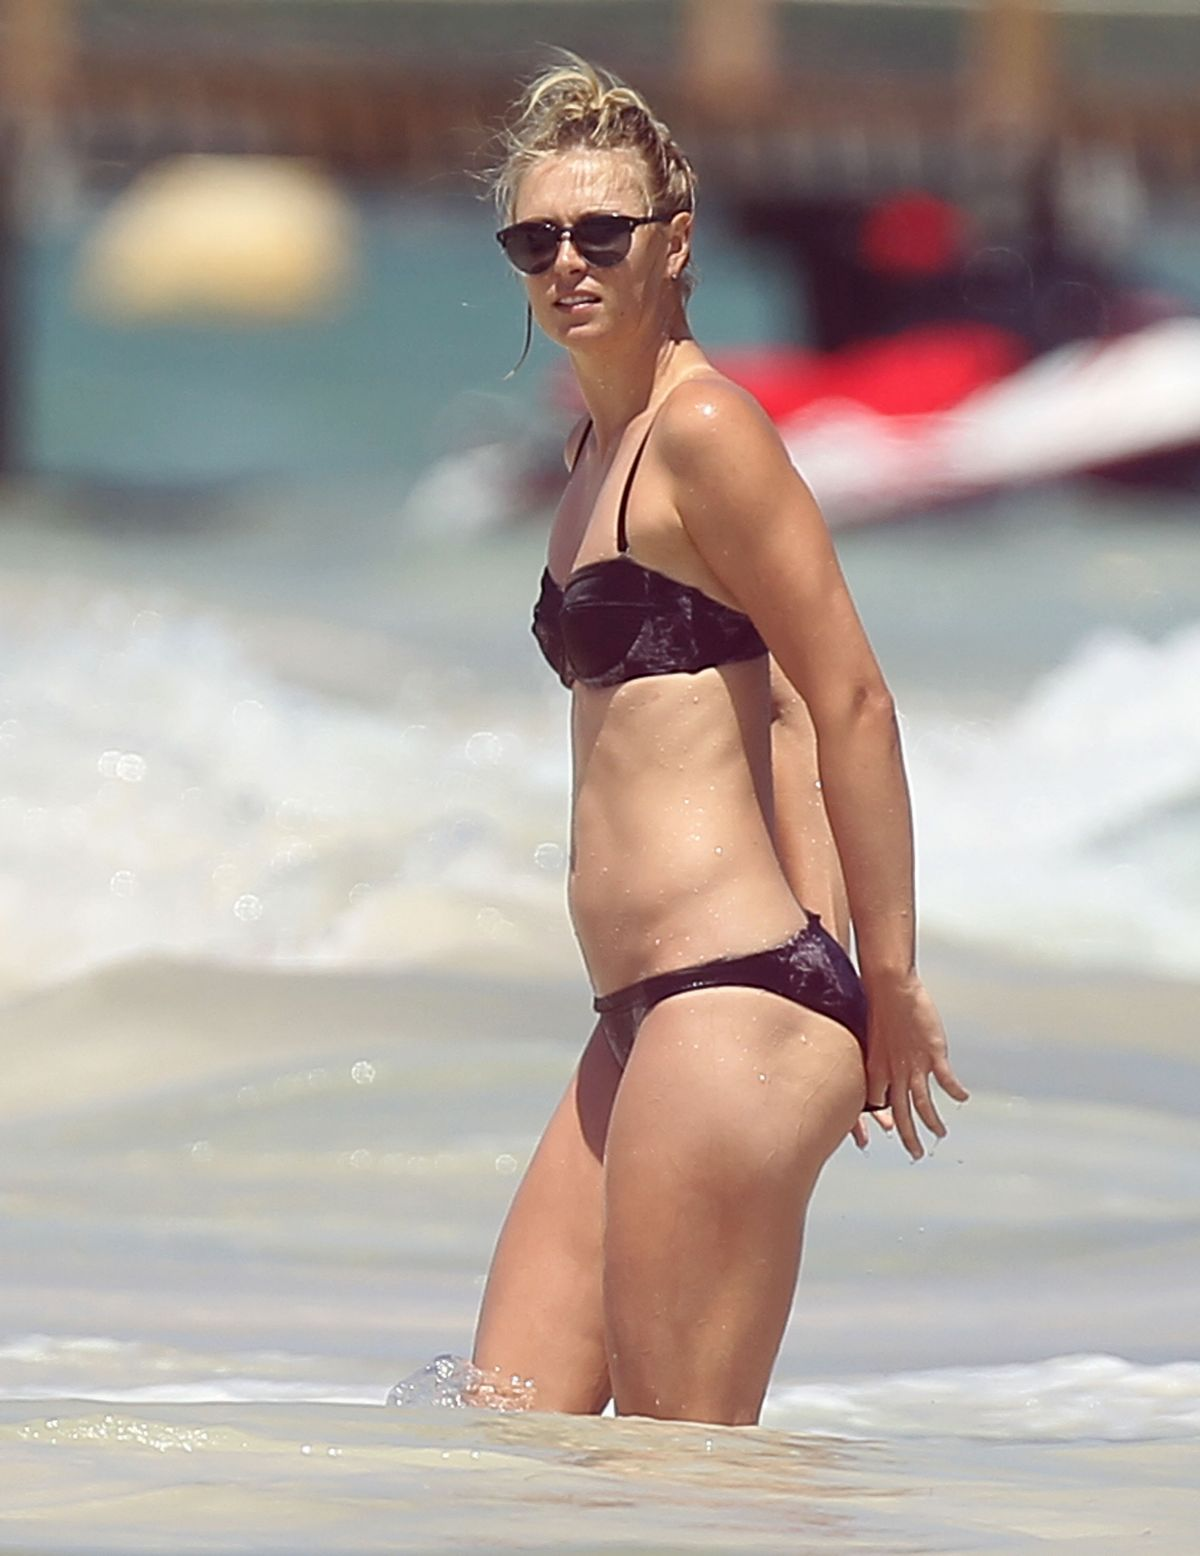 Bikini maria picture sharapova